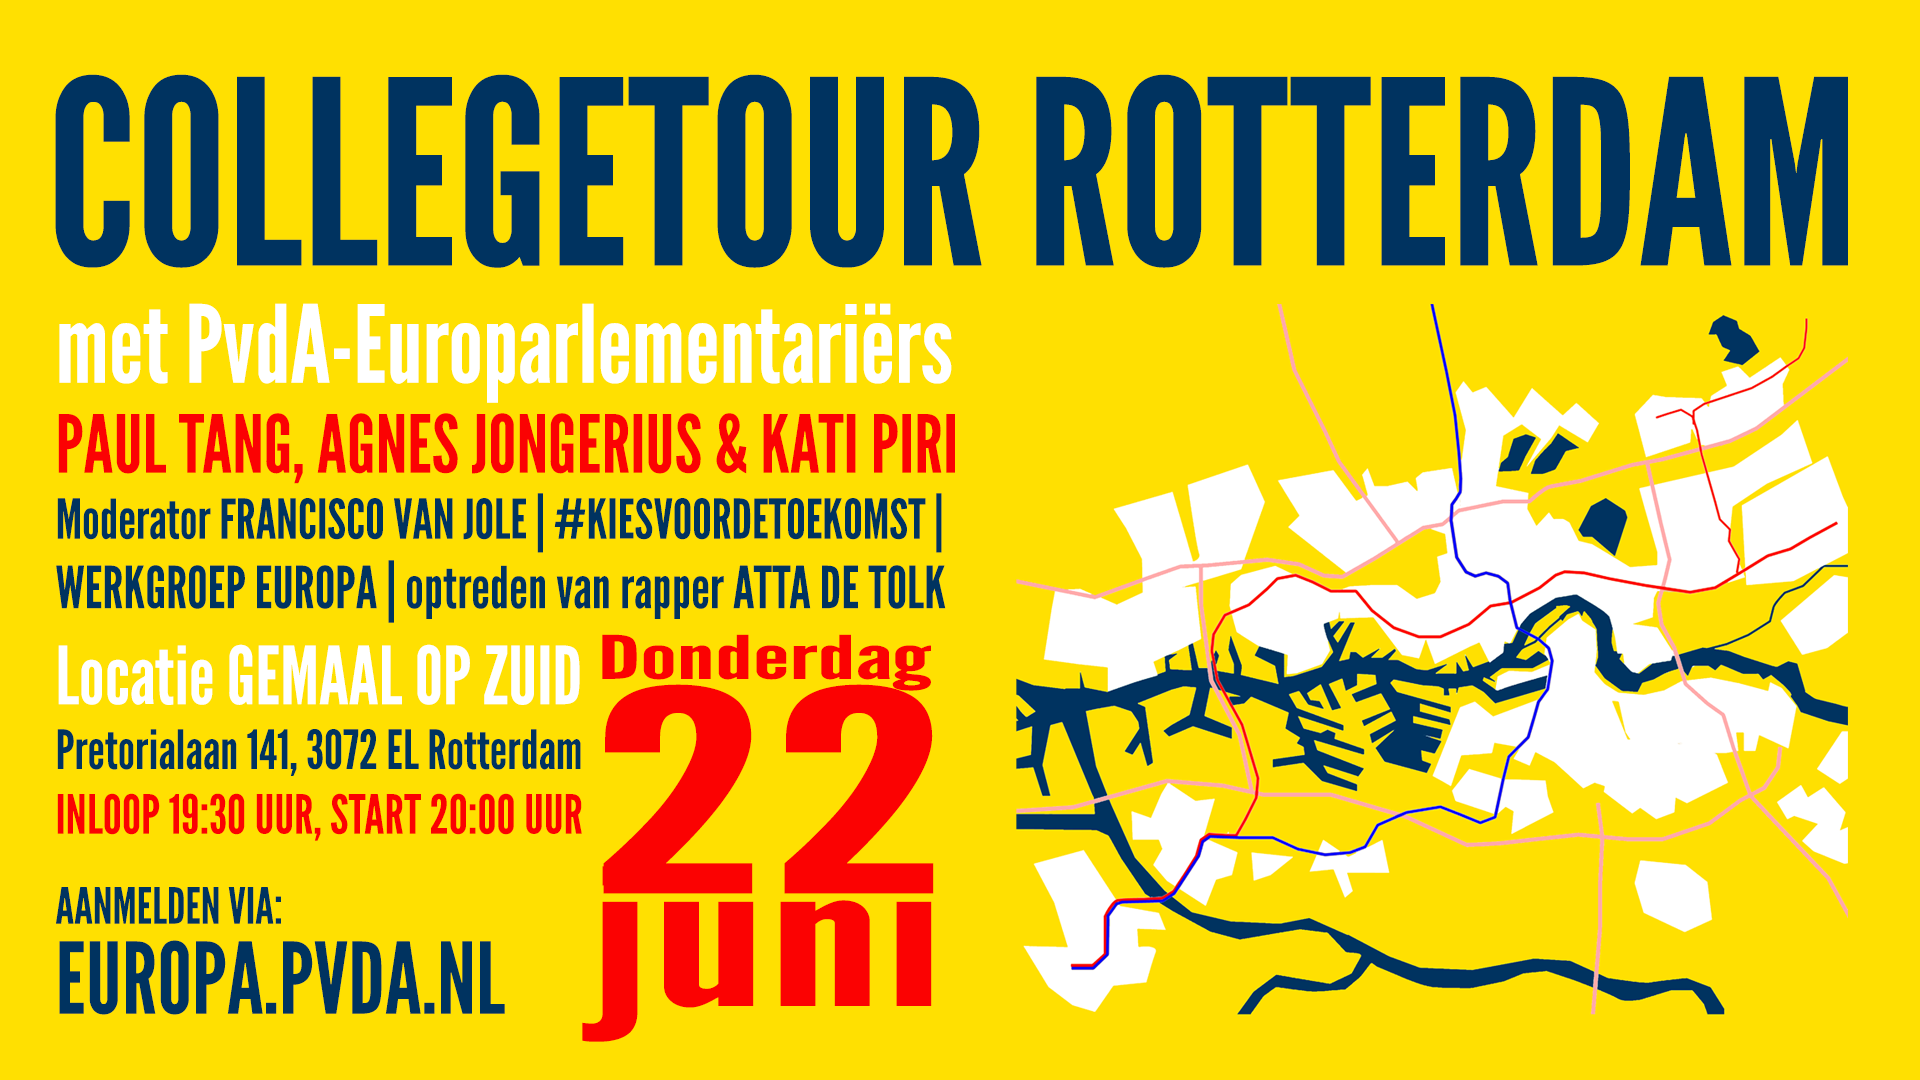 Social media Rotterdam Europa Collegetour